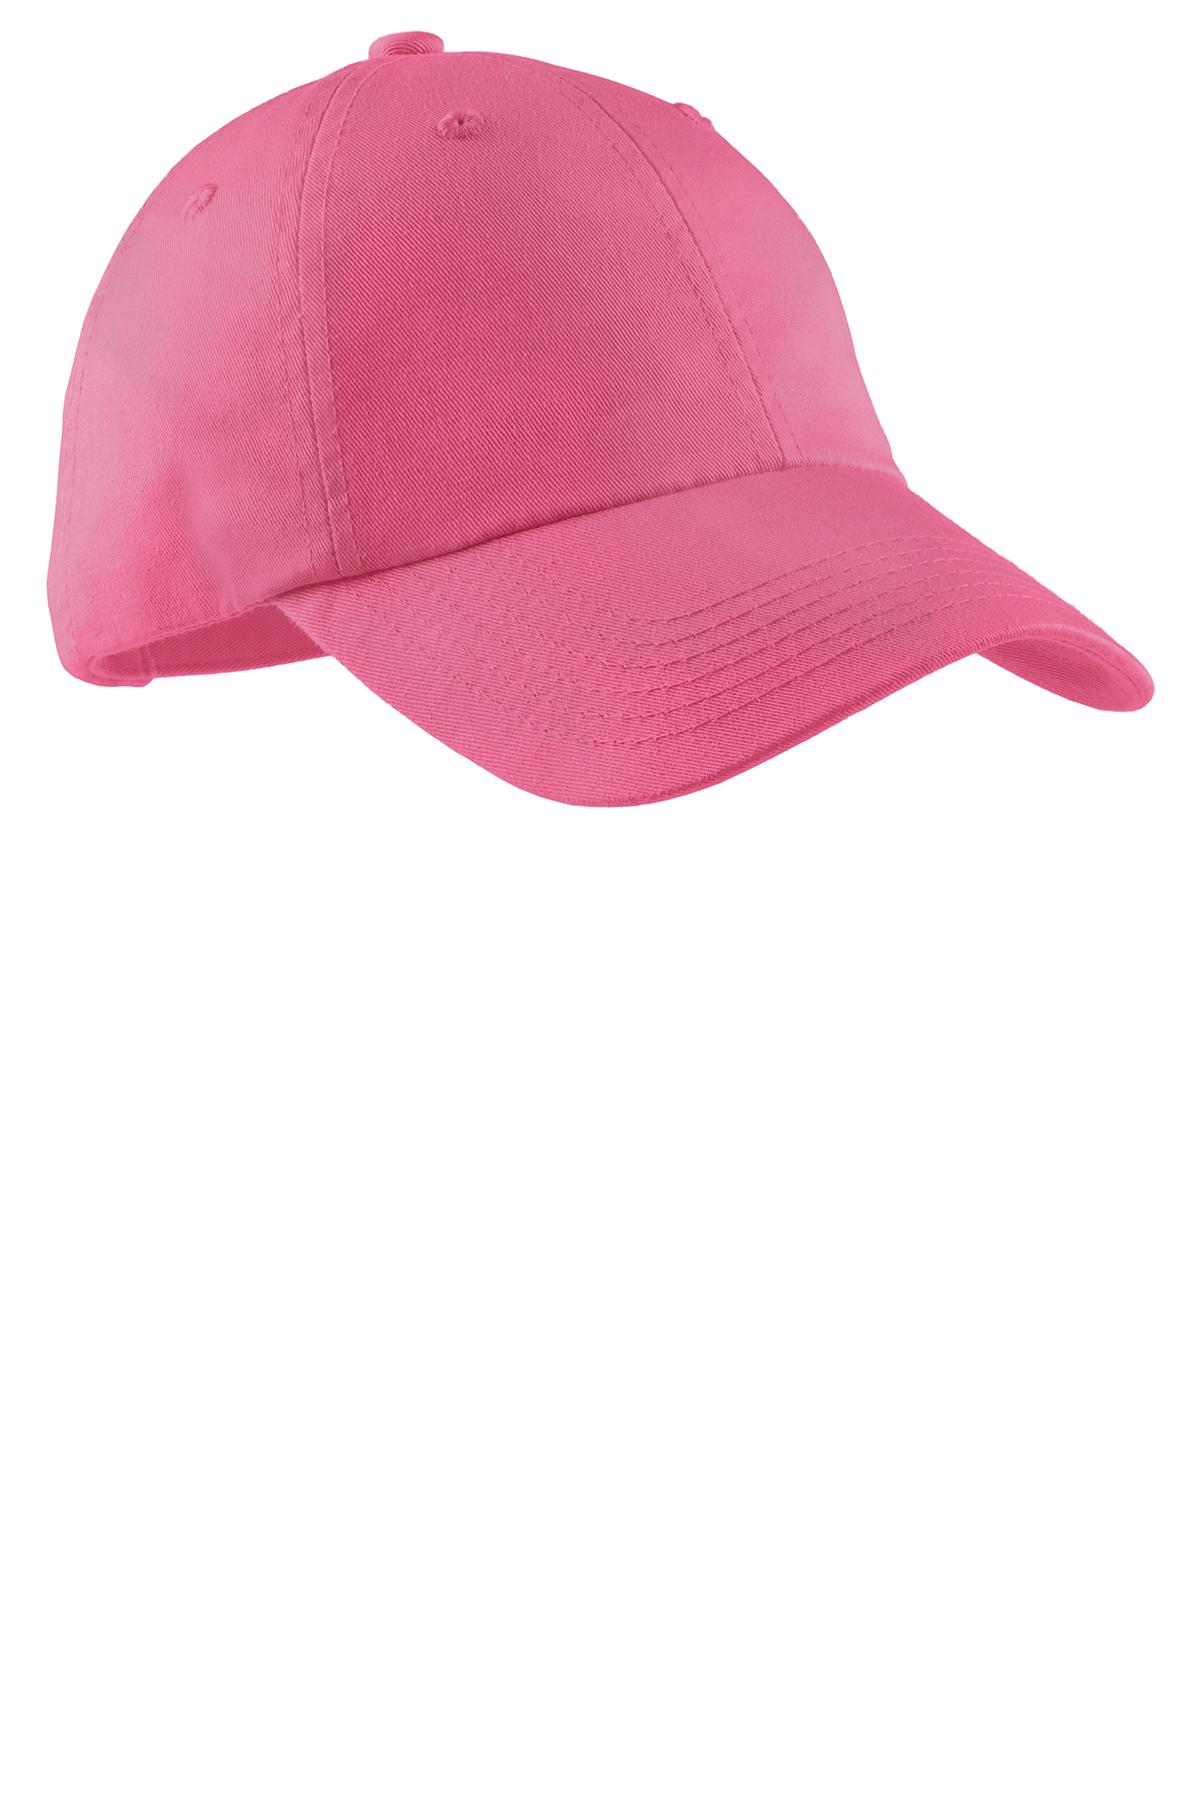 28f05880d00b8 Port Authority® Ladies Garment Washed Cap